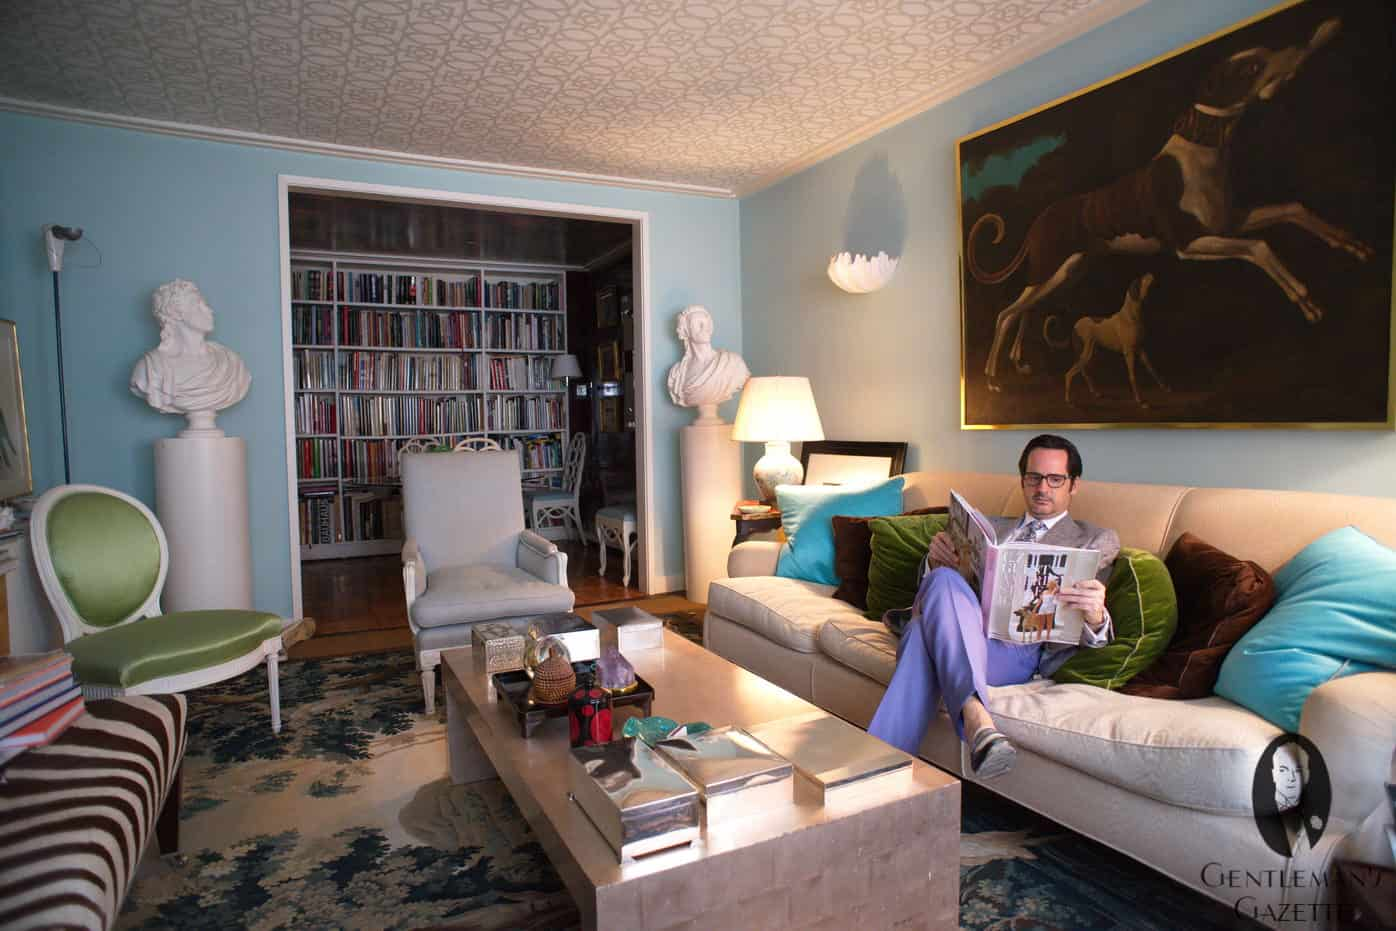 James Andrew Interior Designer Blogger Gentleman of Style